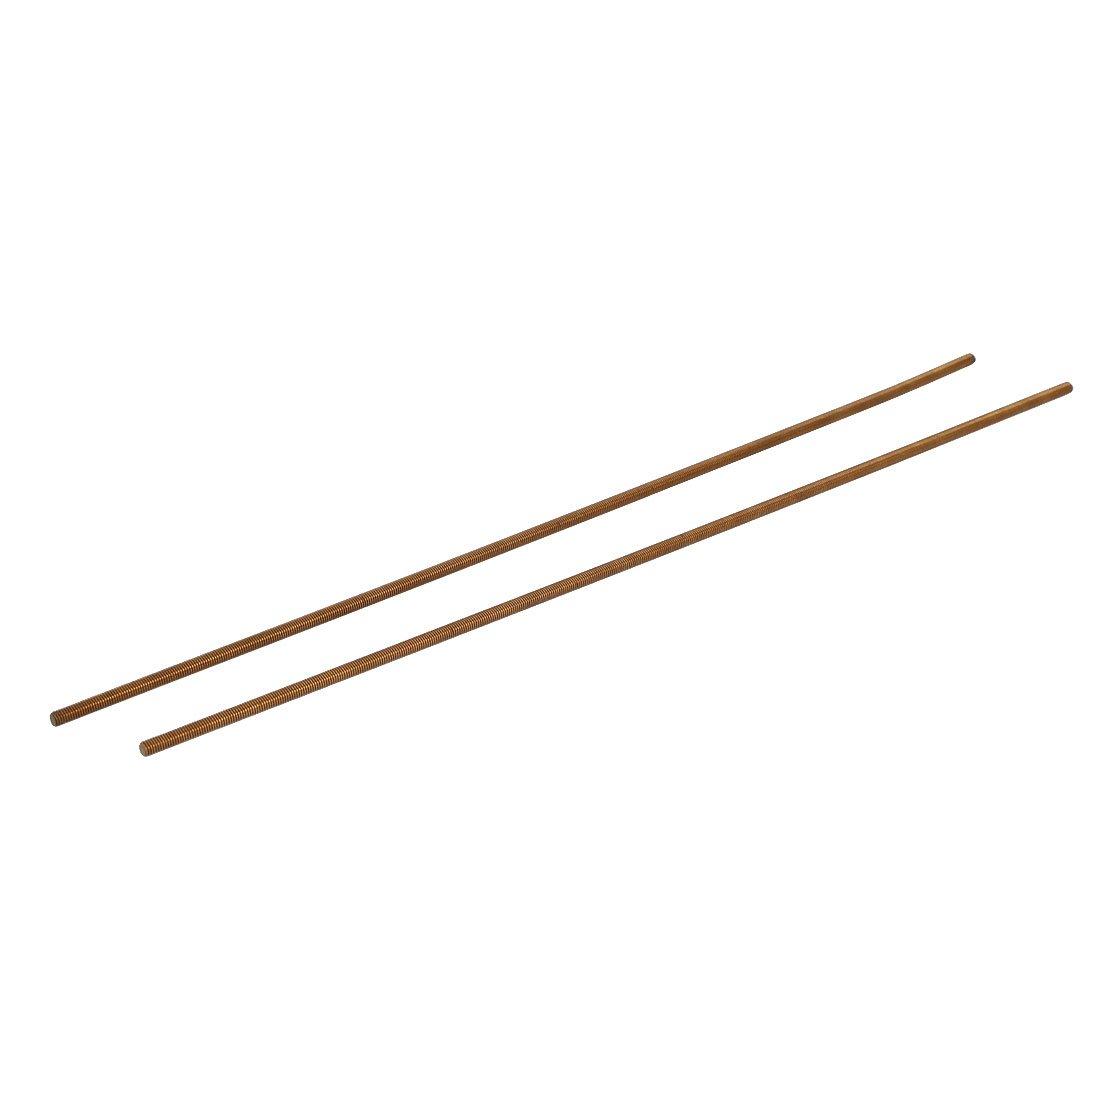 Uxcell a16040100ux0225 M3 x 250mm Male Threaded 0.5mm Pitch All Thread Brass Rod Bar